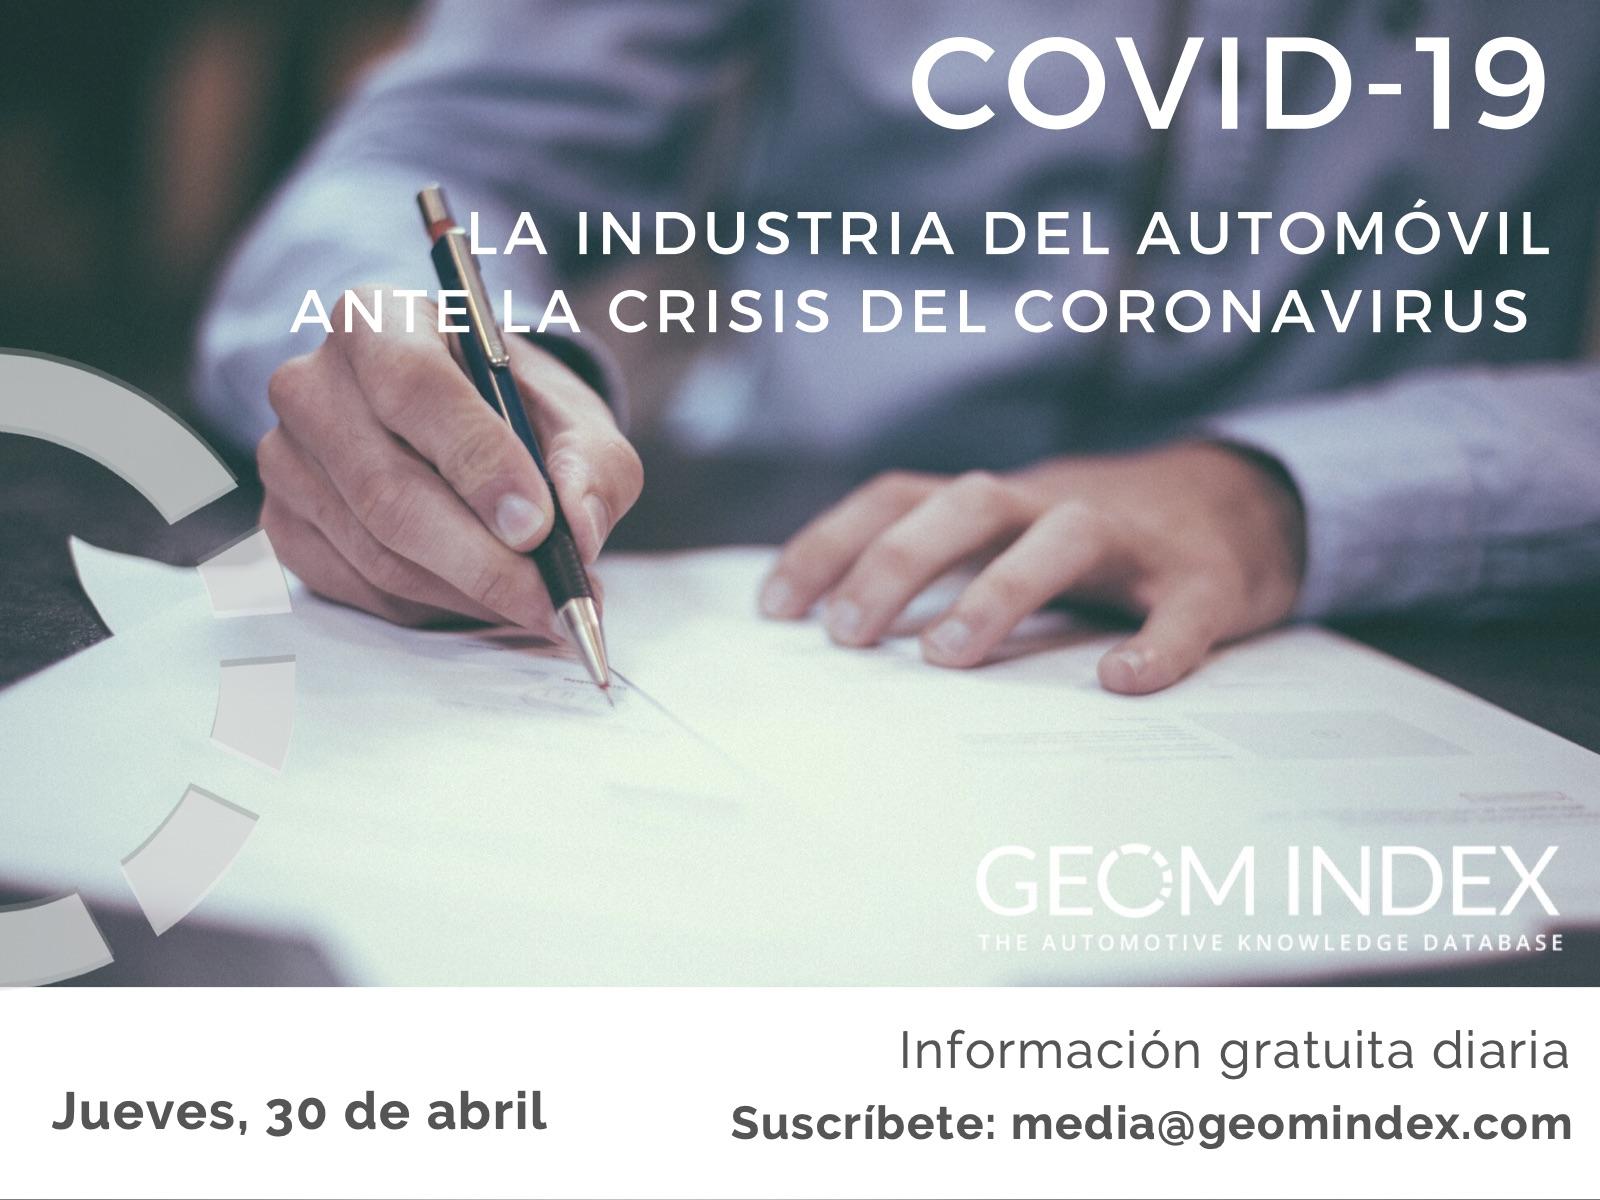 Informe 30 de abril – La industria del automóvil ante la crisis del Covid-19